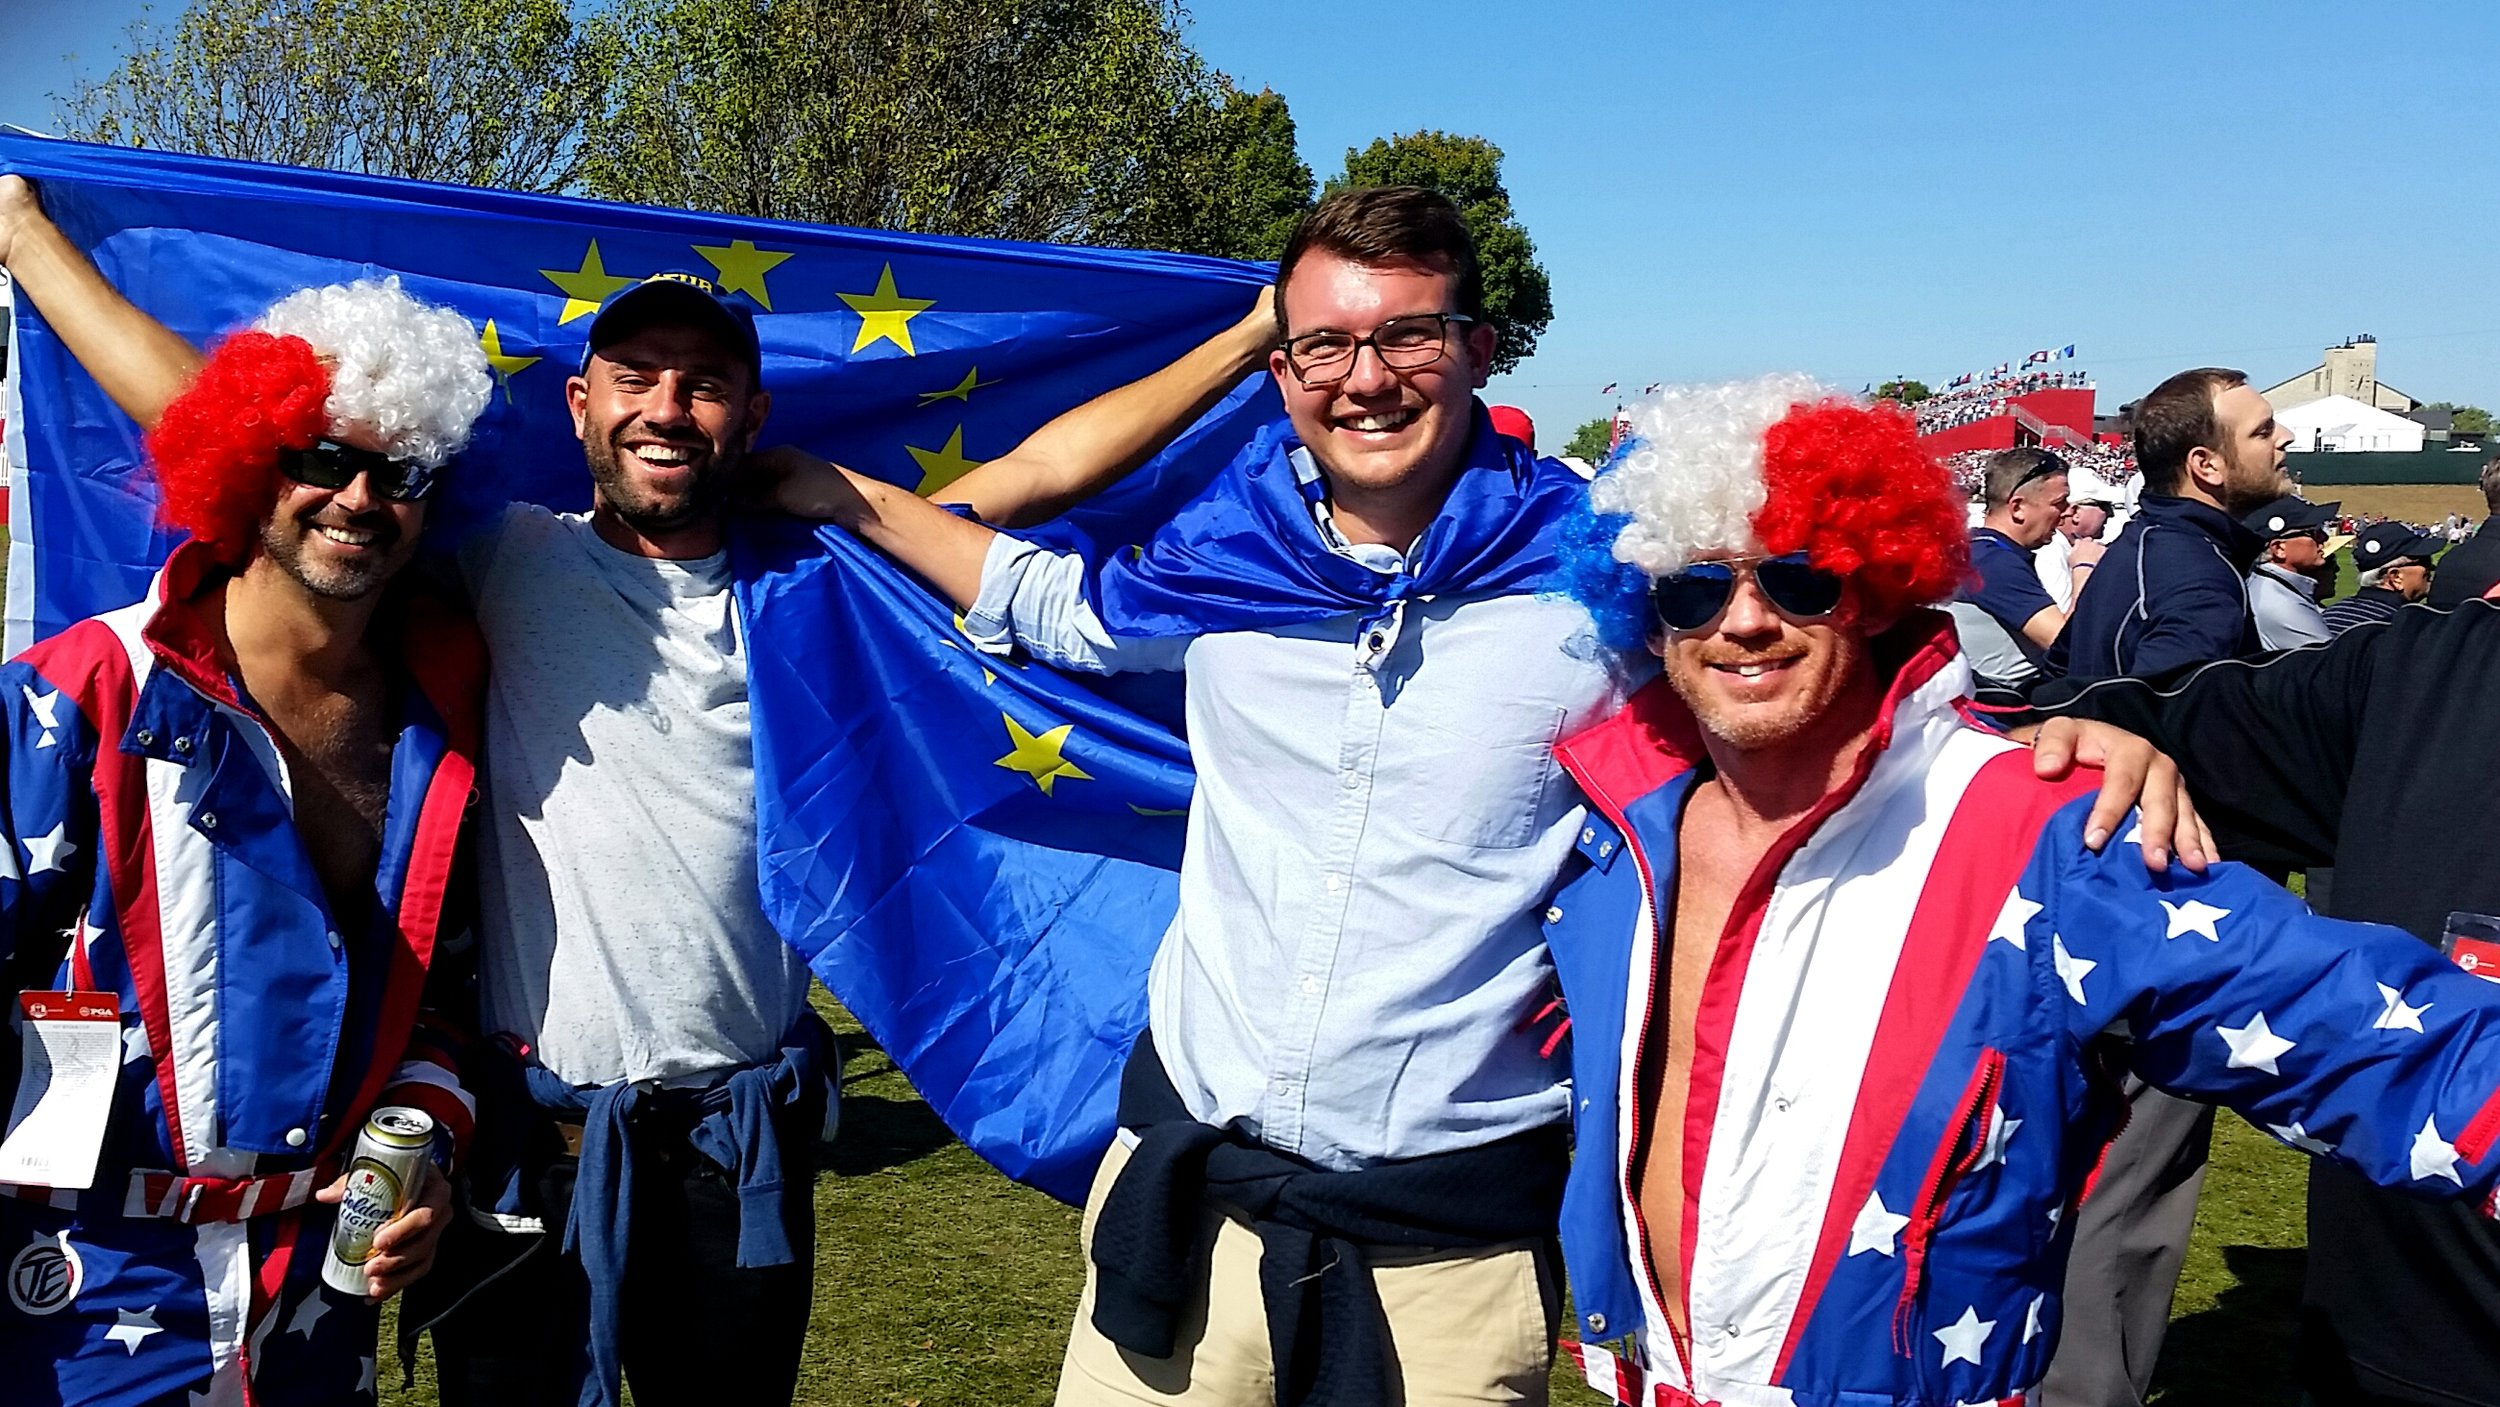 Deluded British man continues to fly European flag, patriotic Americans in a pre-Trump era.